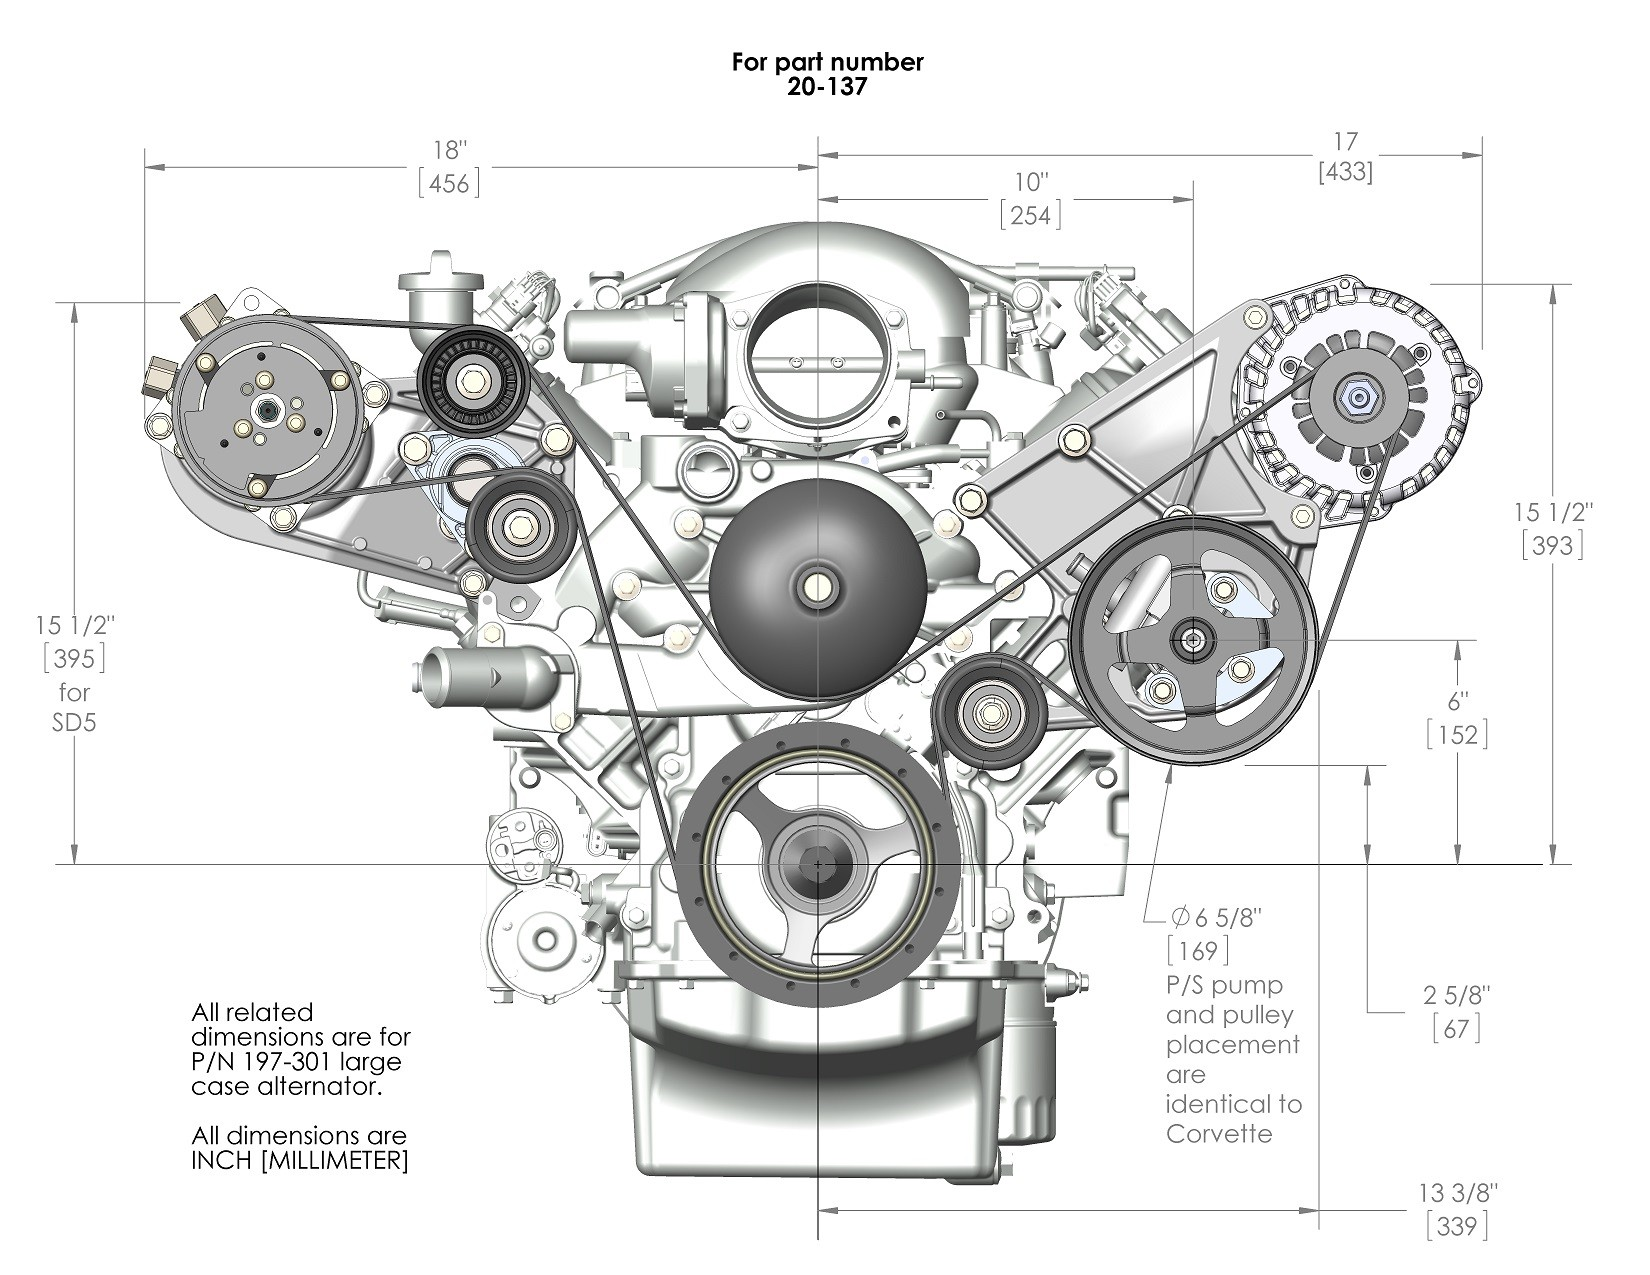 Diagram Of Car Part 20 137 Dimensions1 1650—1275 Ls Engines Pinterest Of Diagram Of Car Part